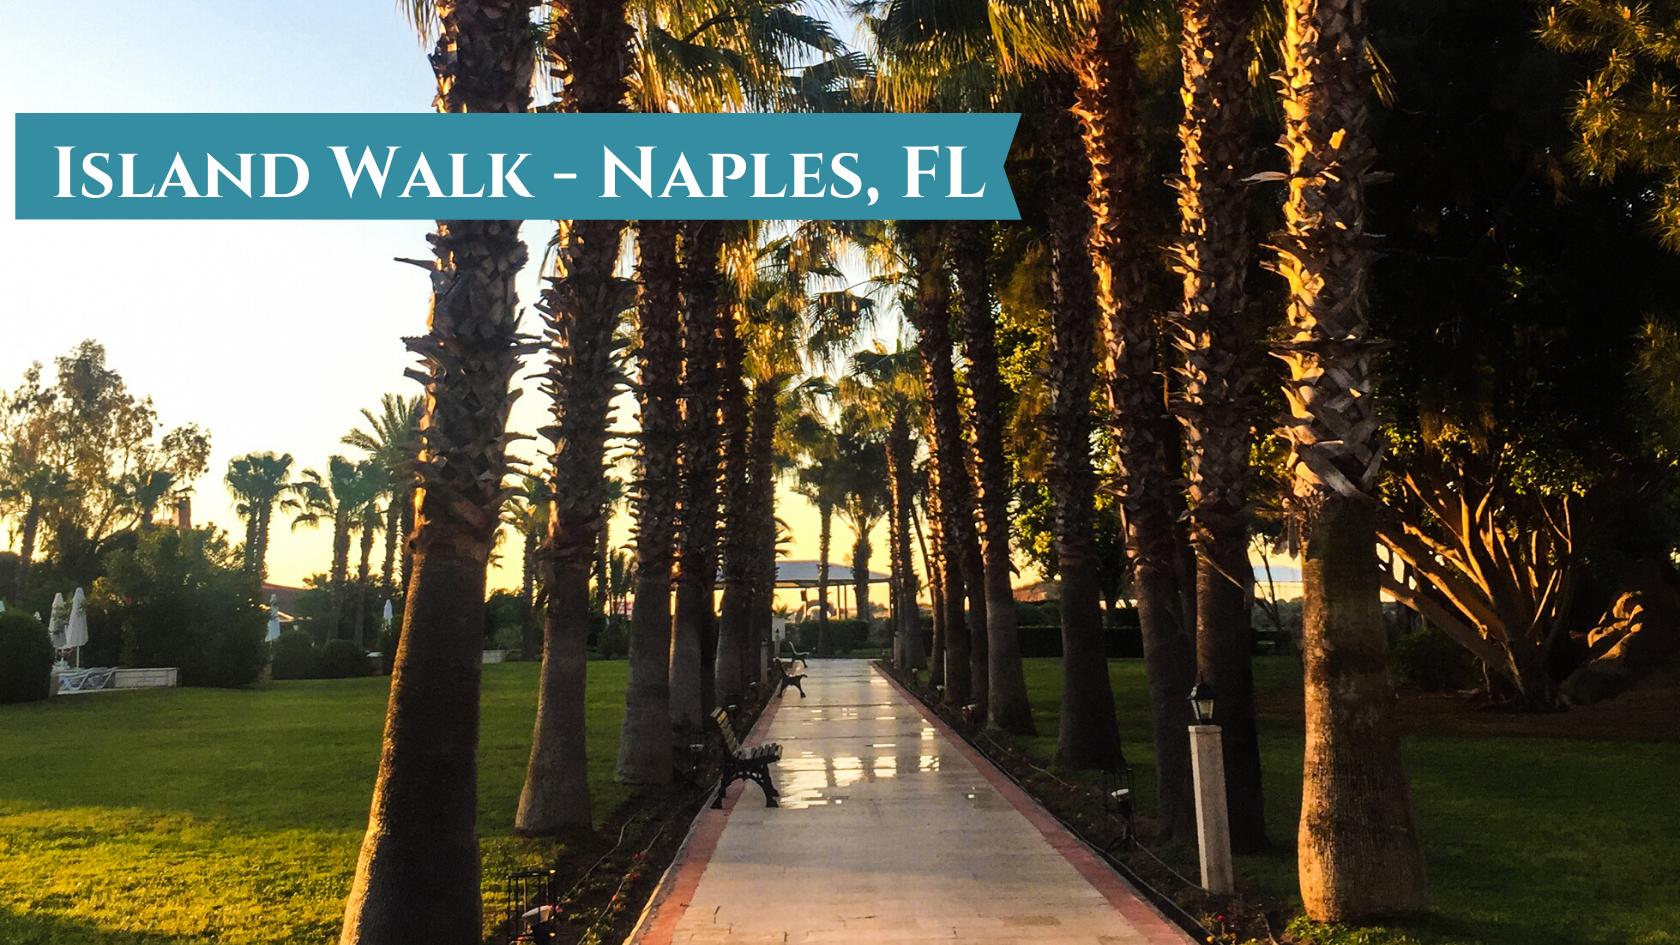 Island Walk - Naples, FL